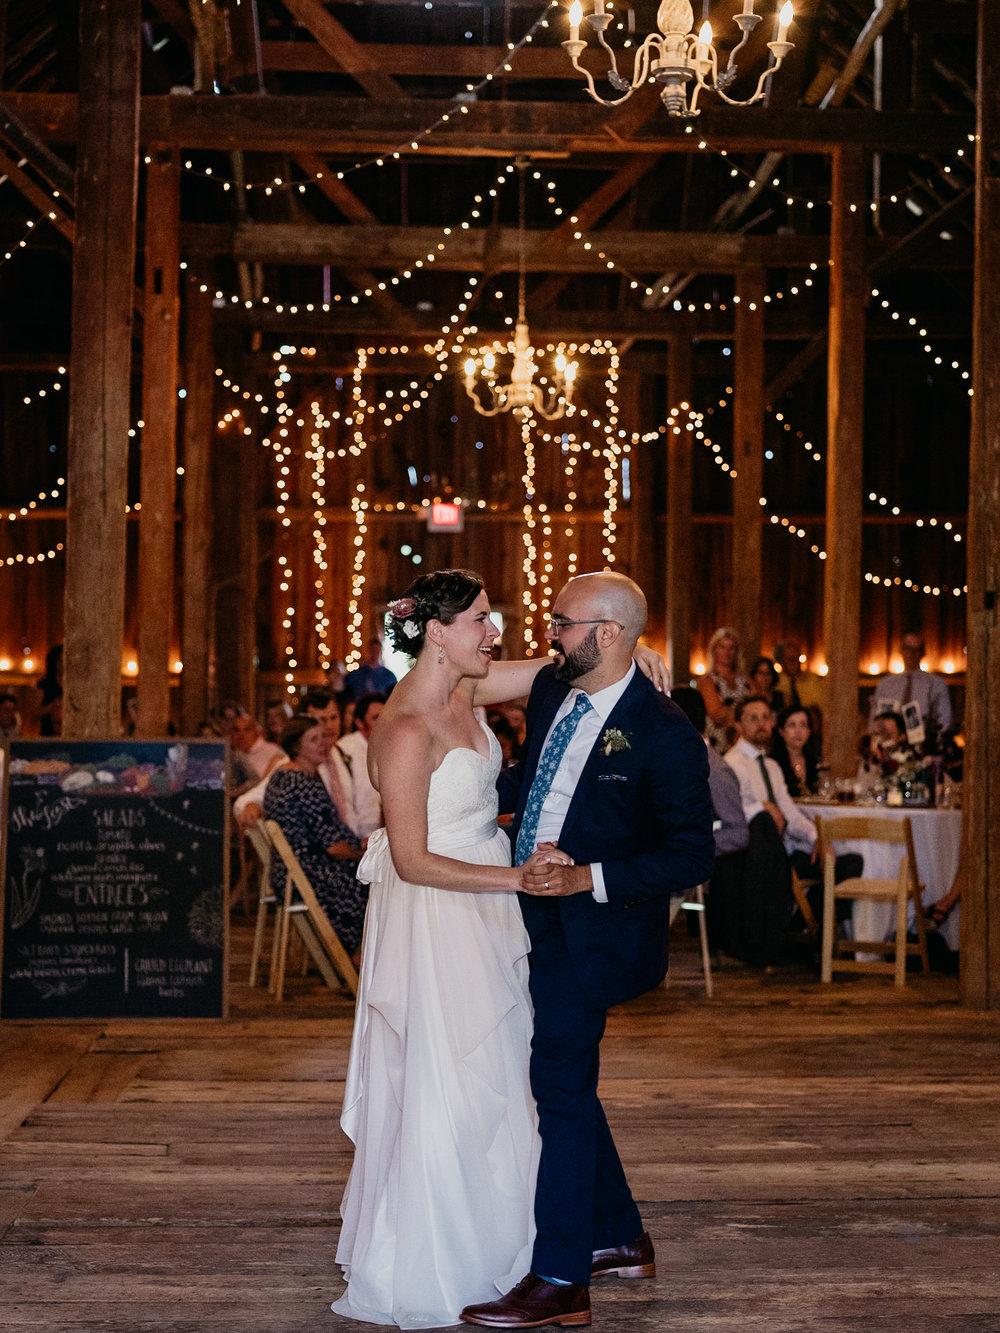 Wiilde-Scout-Photo-Co-Lauren-Steve-Bliss-Ridge-Wedding-Moretown-Vermont-212.jpg